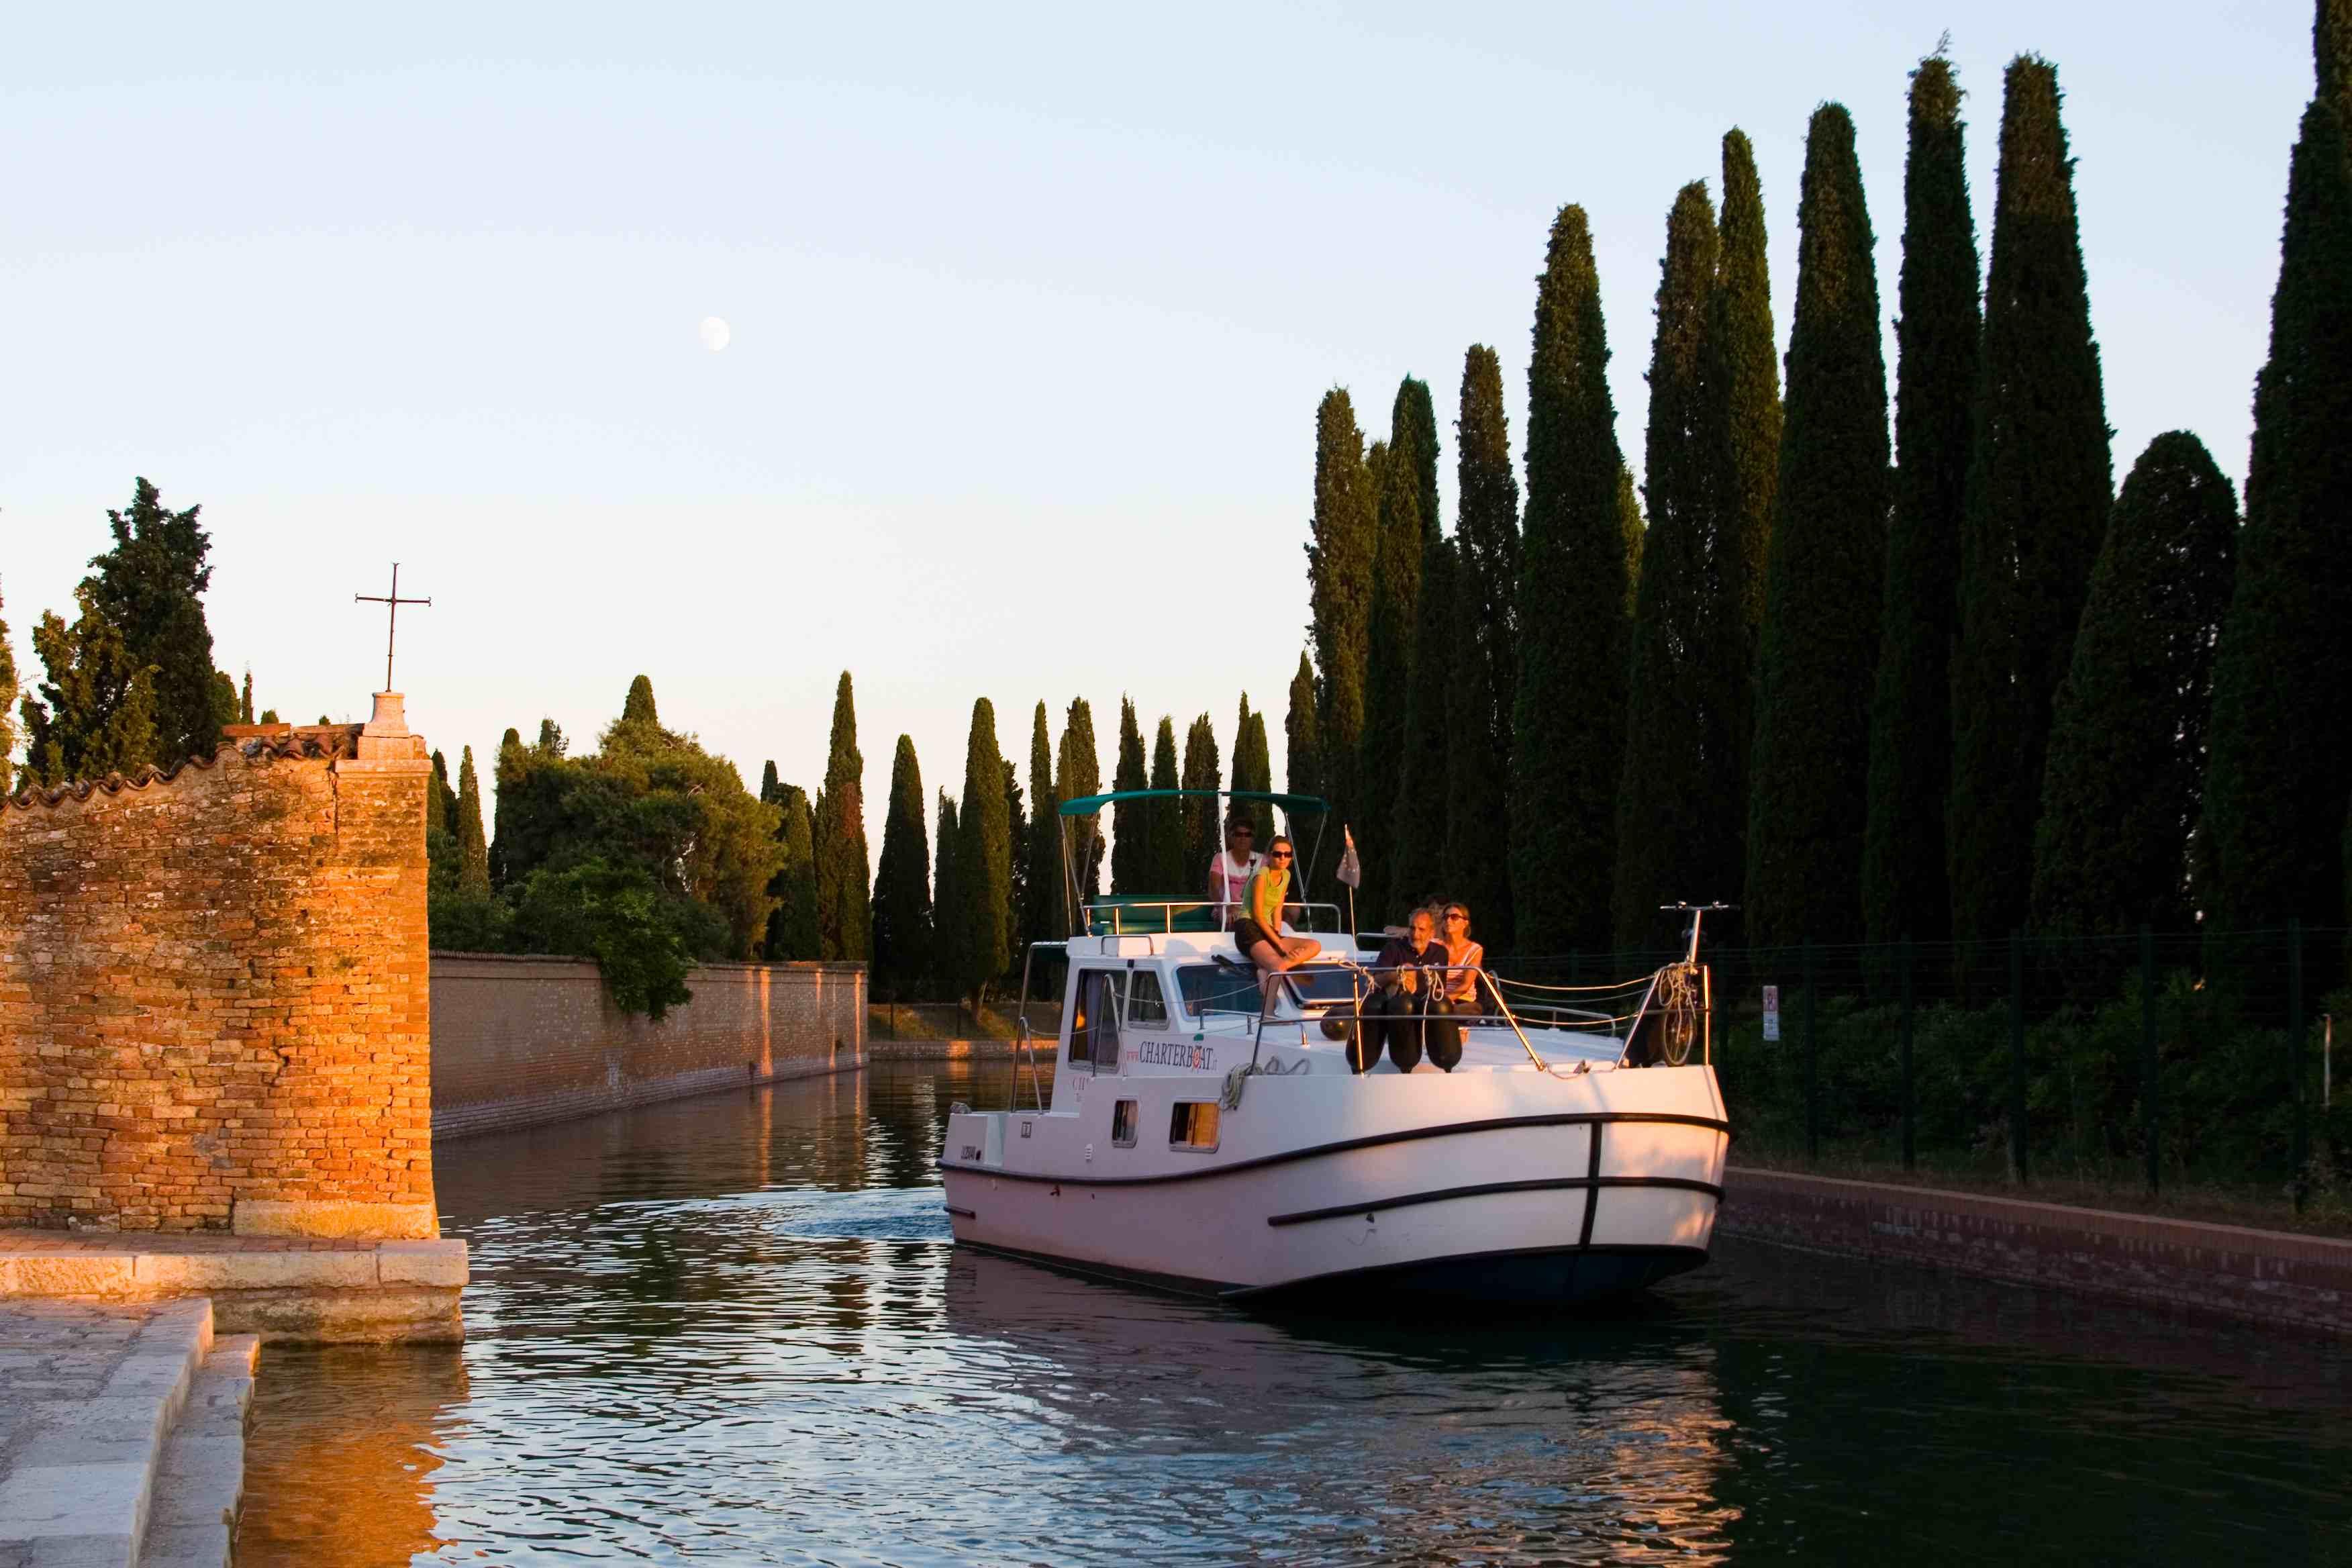 IMG_1796Avventura noleggio barche Venezia